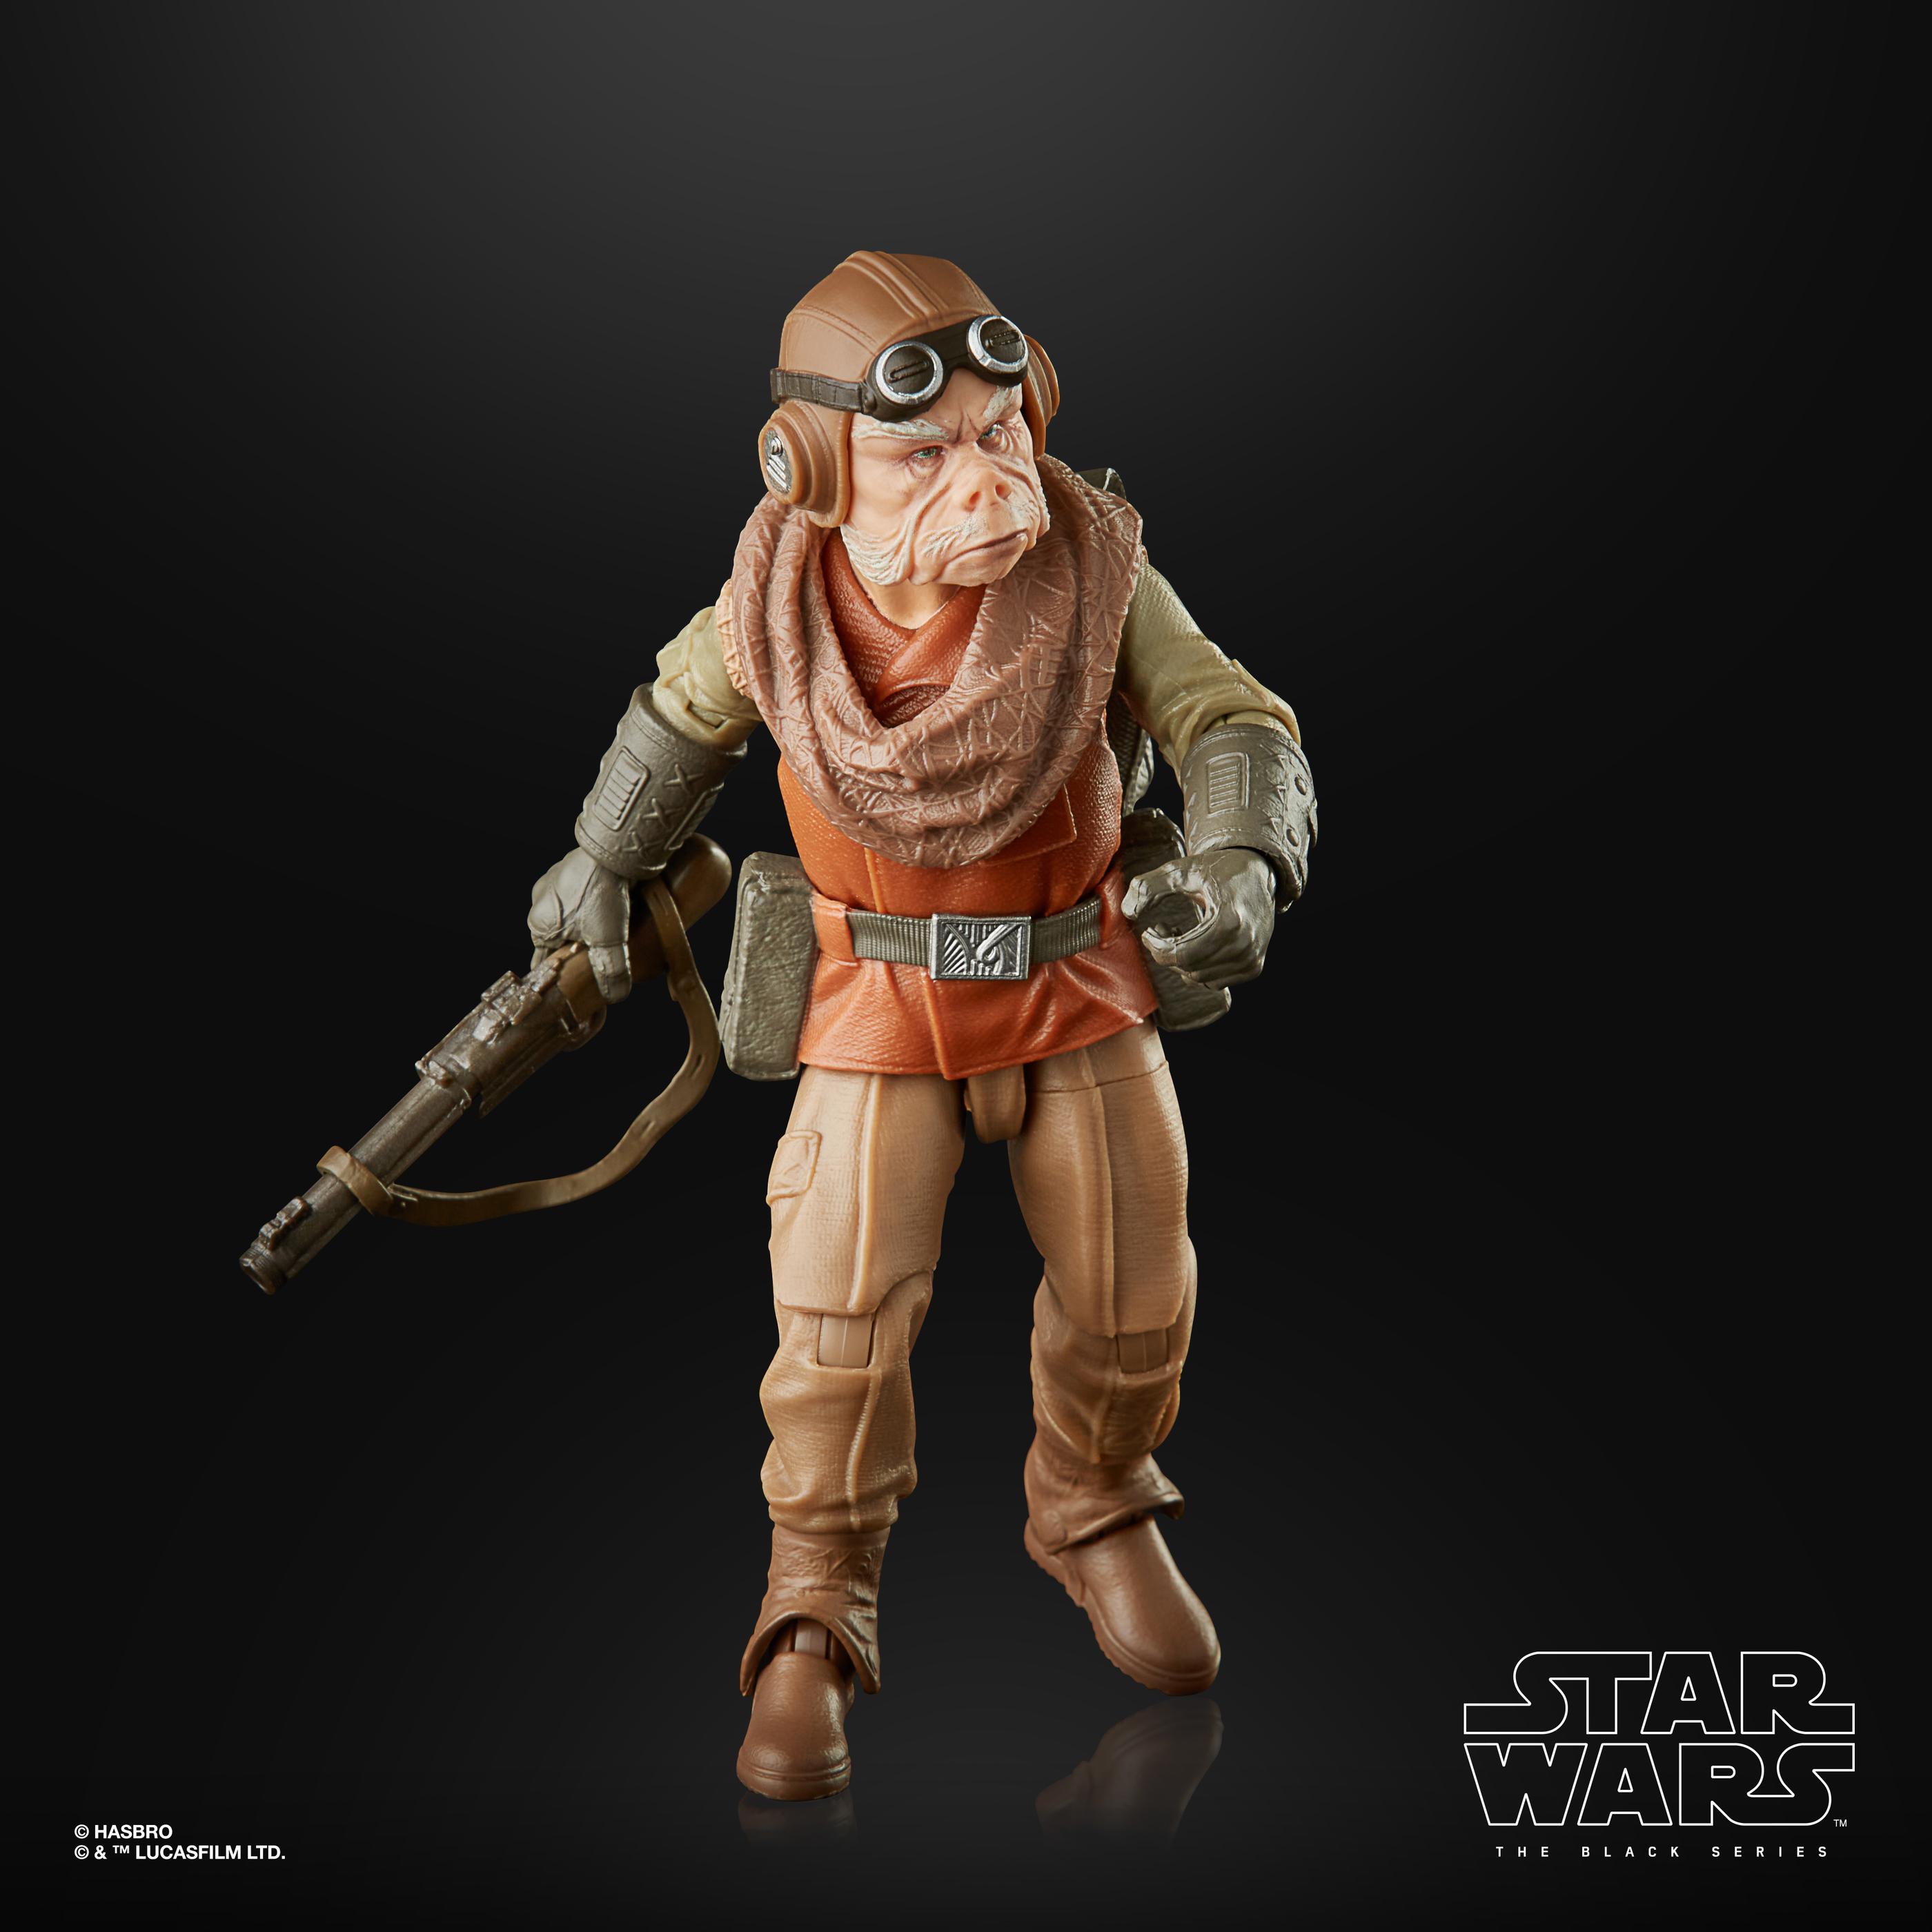 Star Wars - The Black Series - The Mandalorian - Kuiil Action Figure